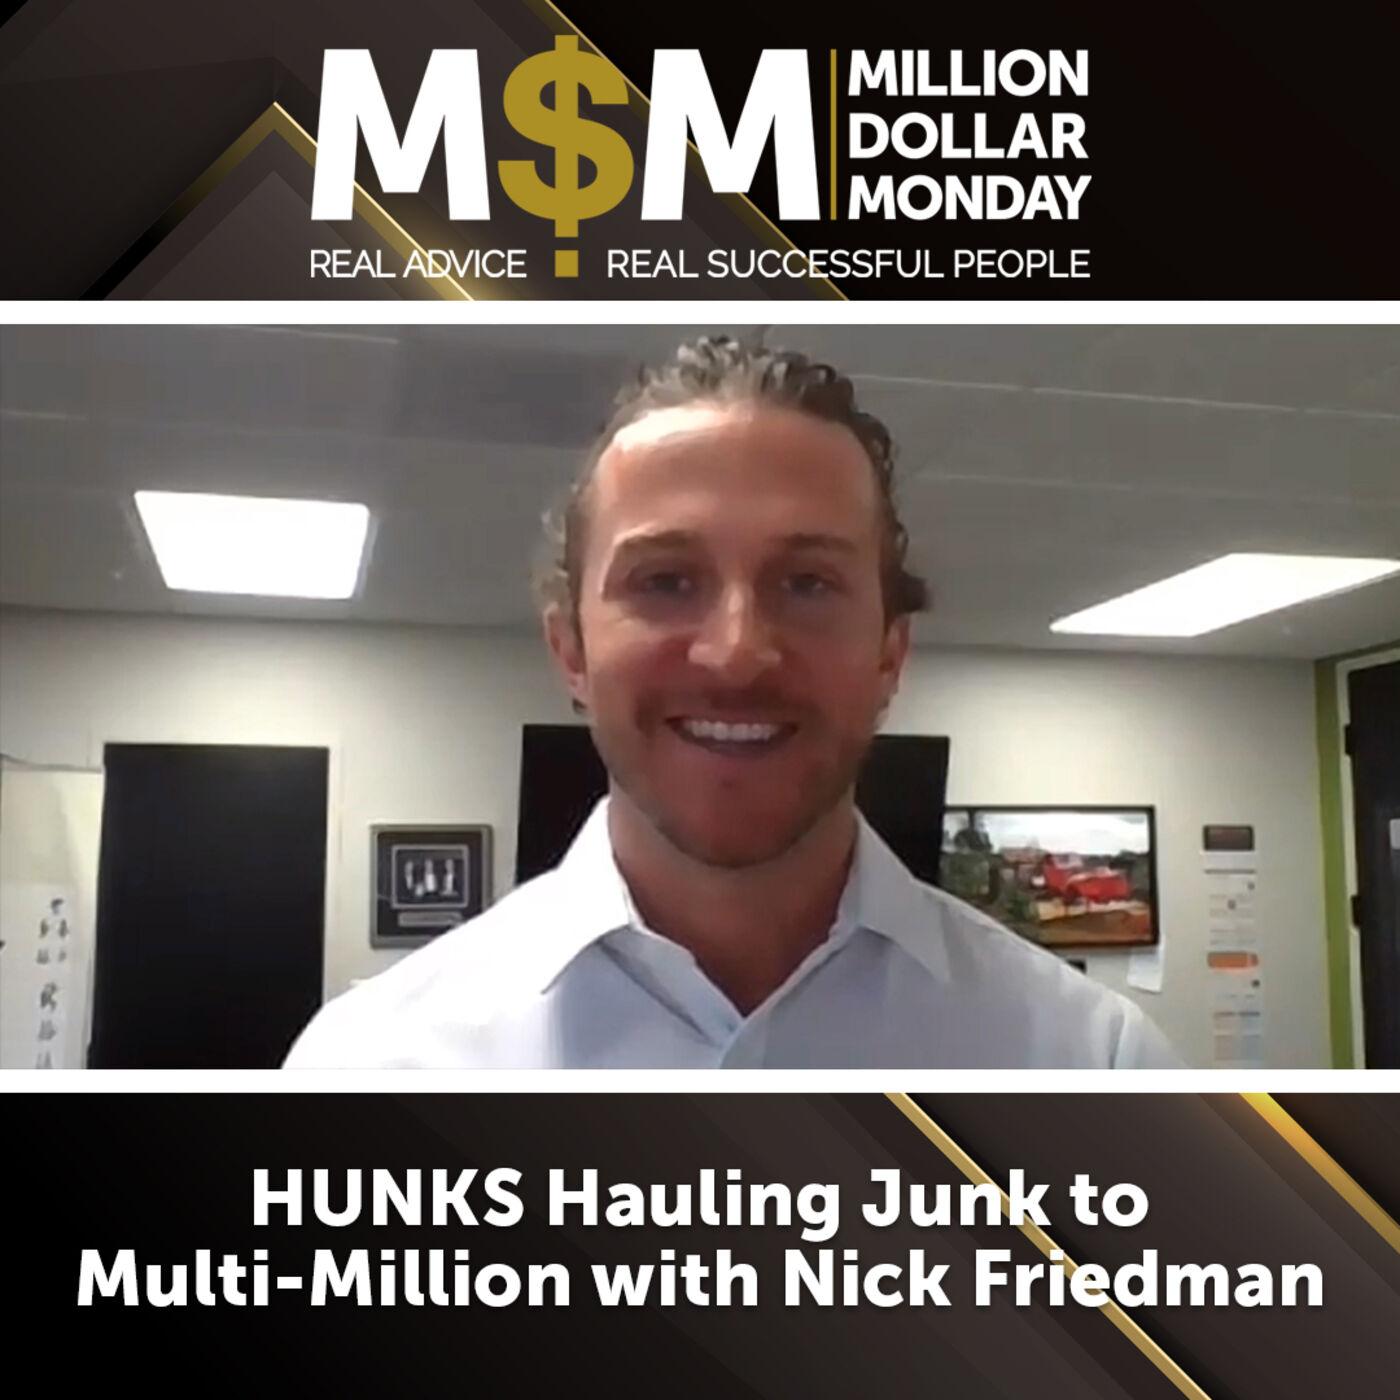 HUNKS Hauling Junk to Multi-Millions with Nick Friedman